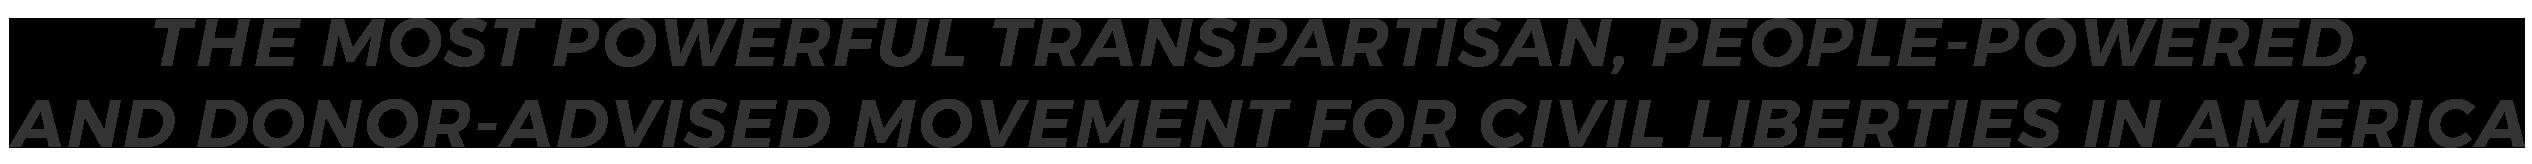 American Civil Liberties Organization - Non Profit Civil Liberties Group